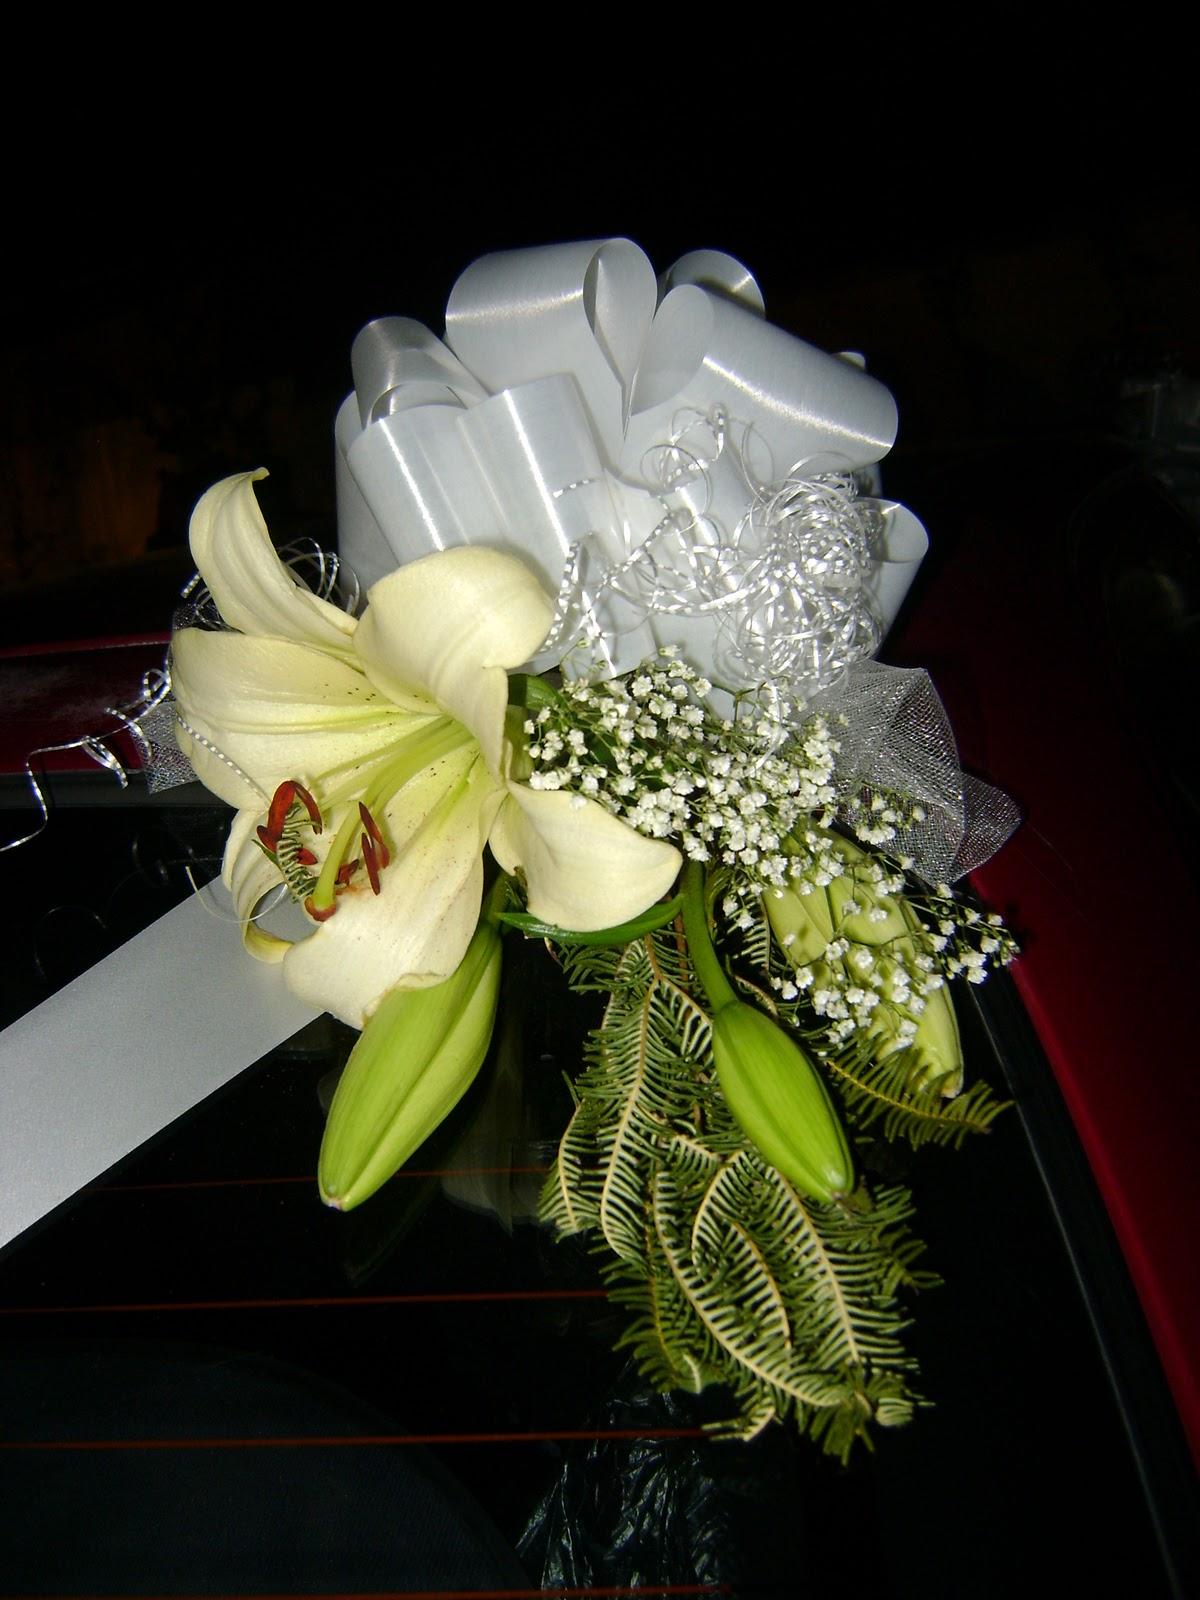 Cintas decorativas mo os especiales para decorar autos de - Cintas para decorar ...